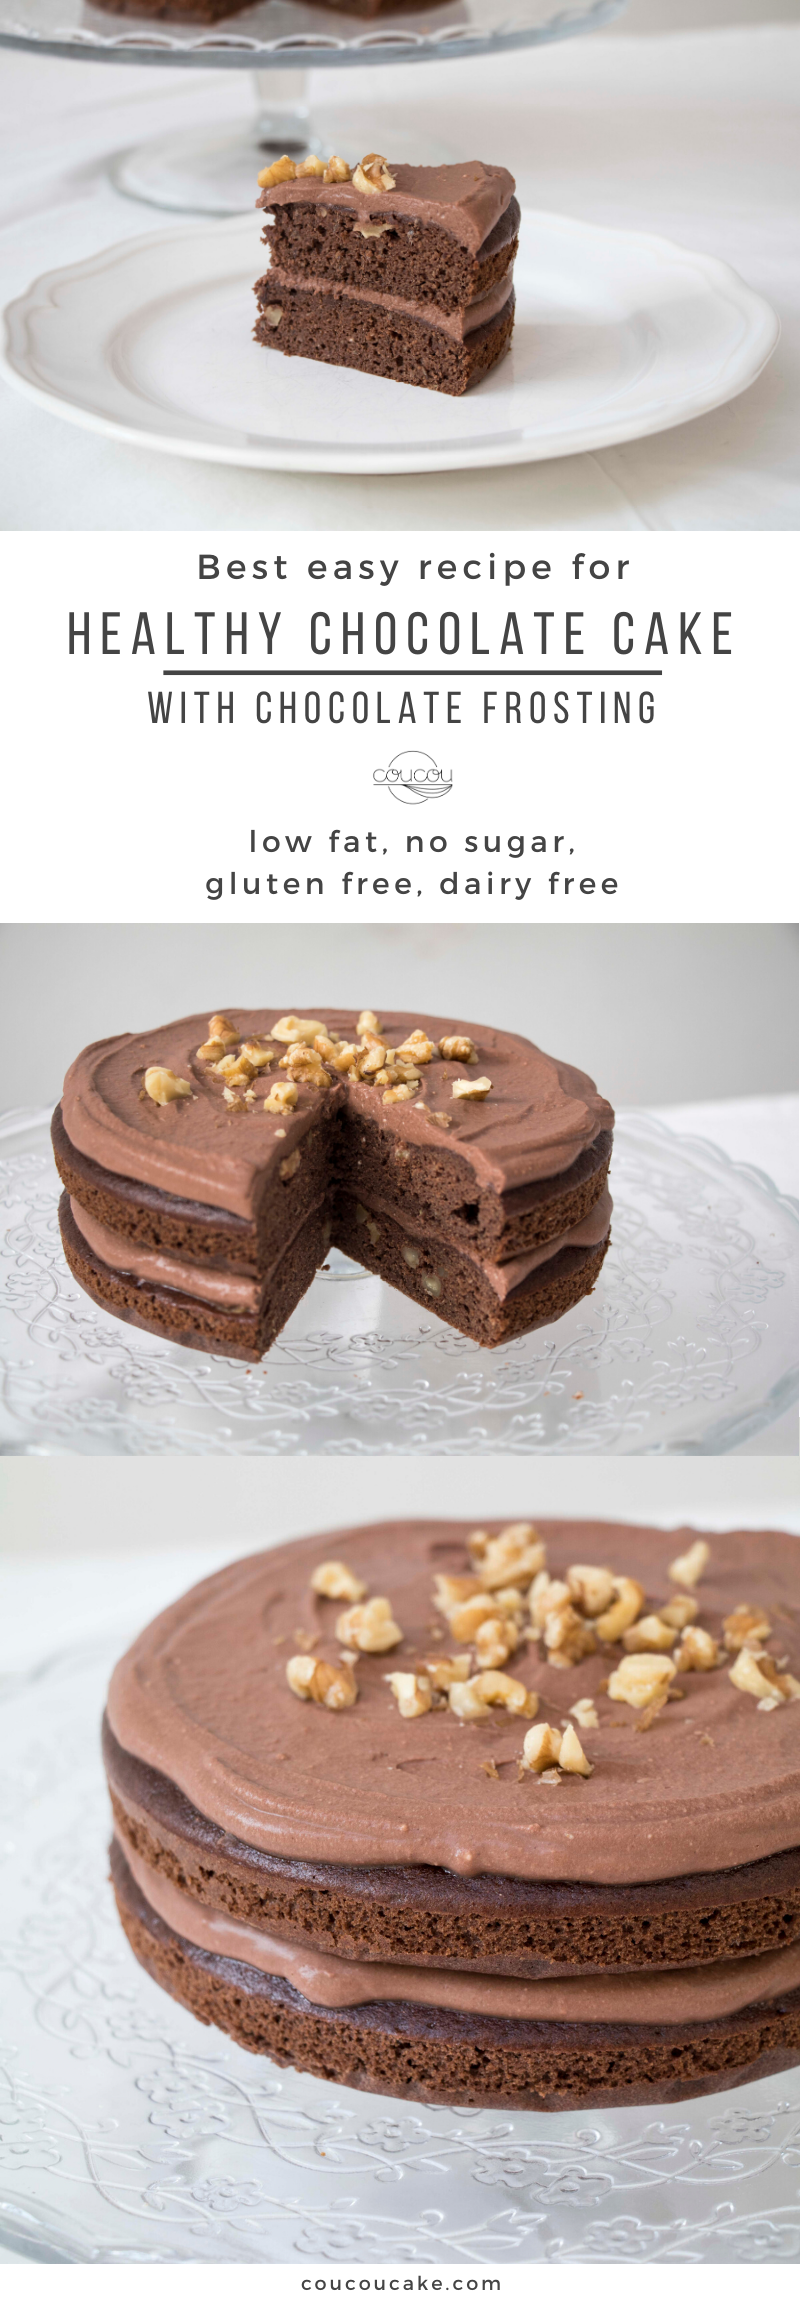 Healthy Chocolate Cake Recipe Coucoucake Cake And Baking Blog Recipe Healthy Chocolate Healthy Chocolate Cake Healthy Chocolate Cake Recipe